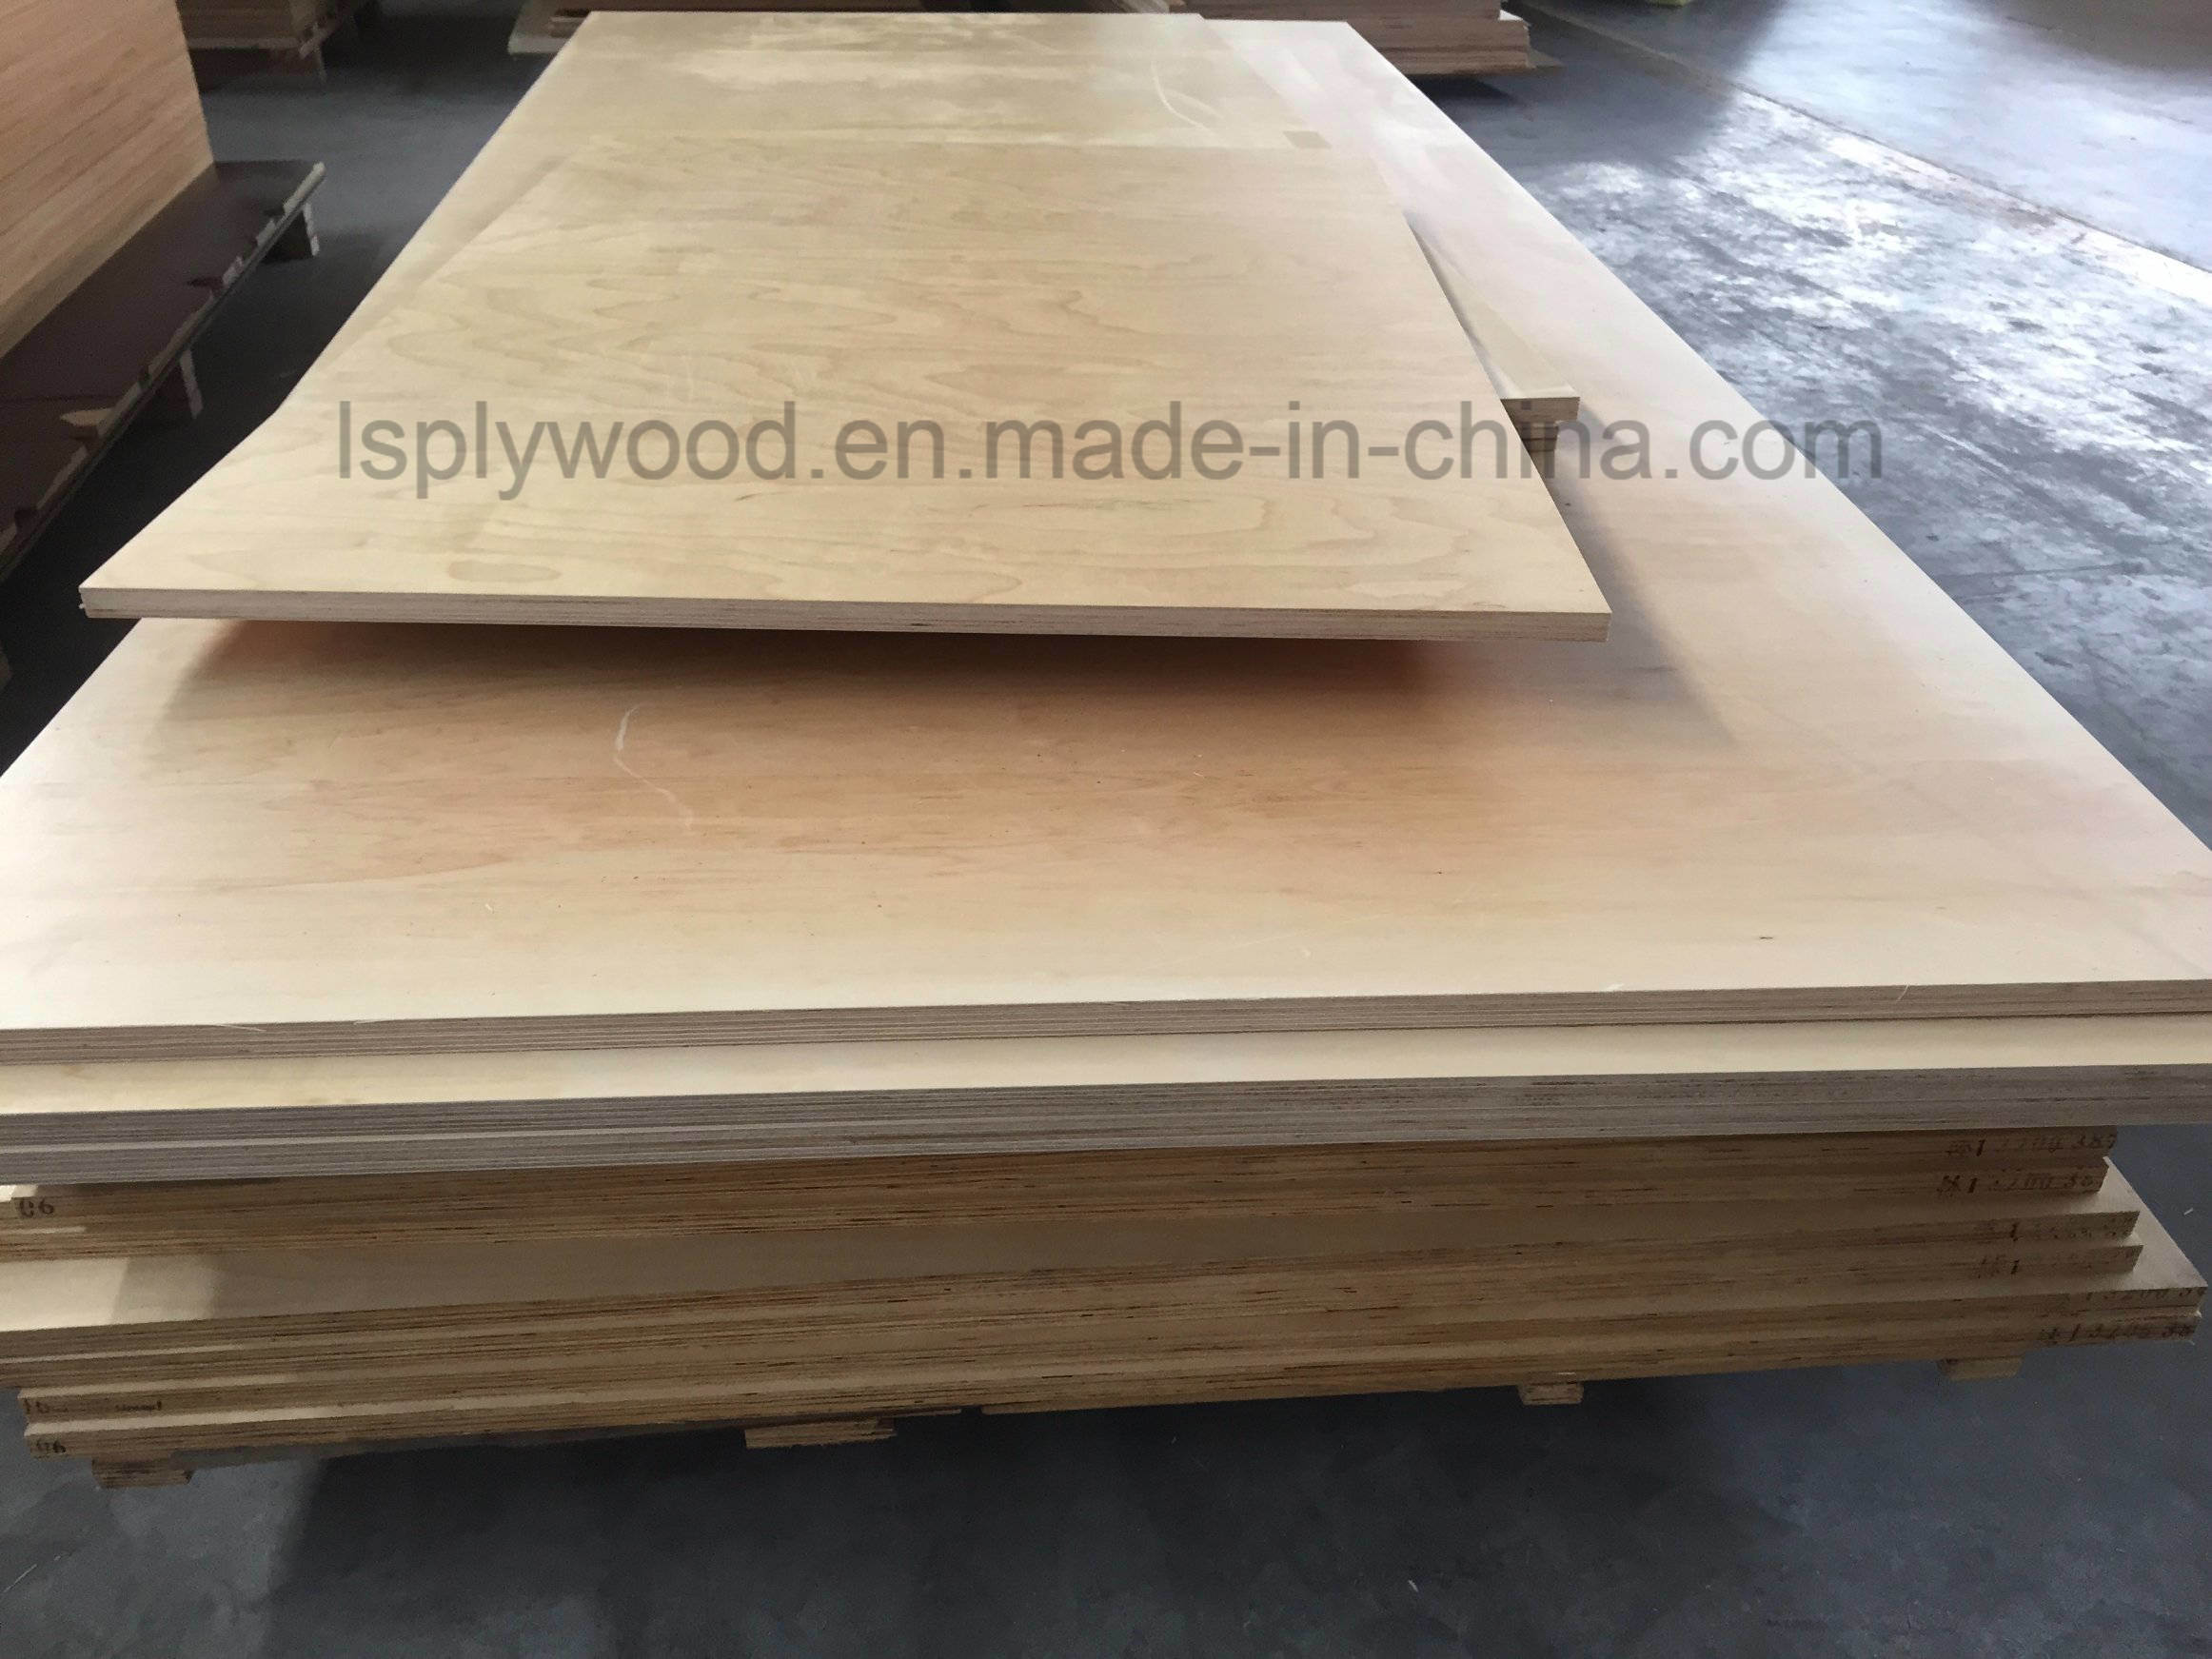 China Plywood Ceiling Panel Laminate, Mold Resistant Laminate Flooring